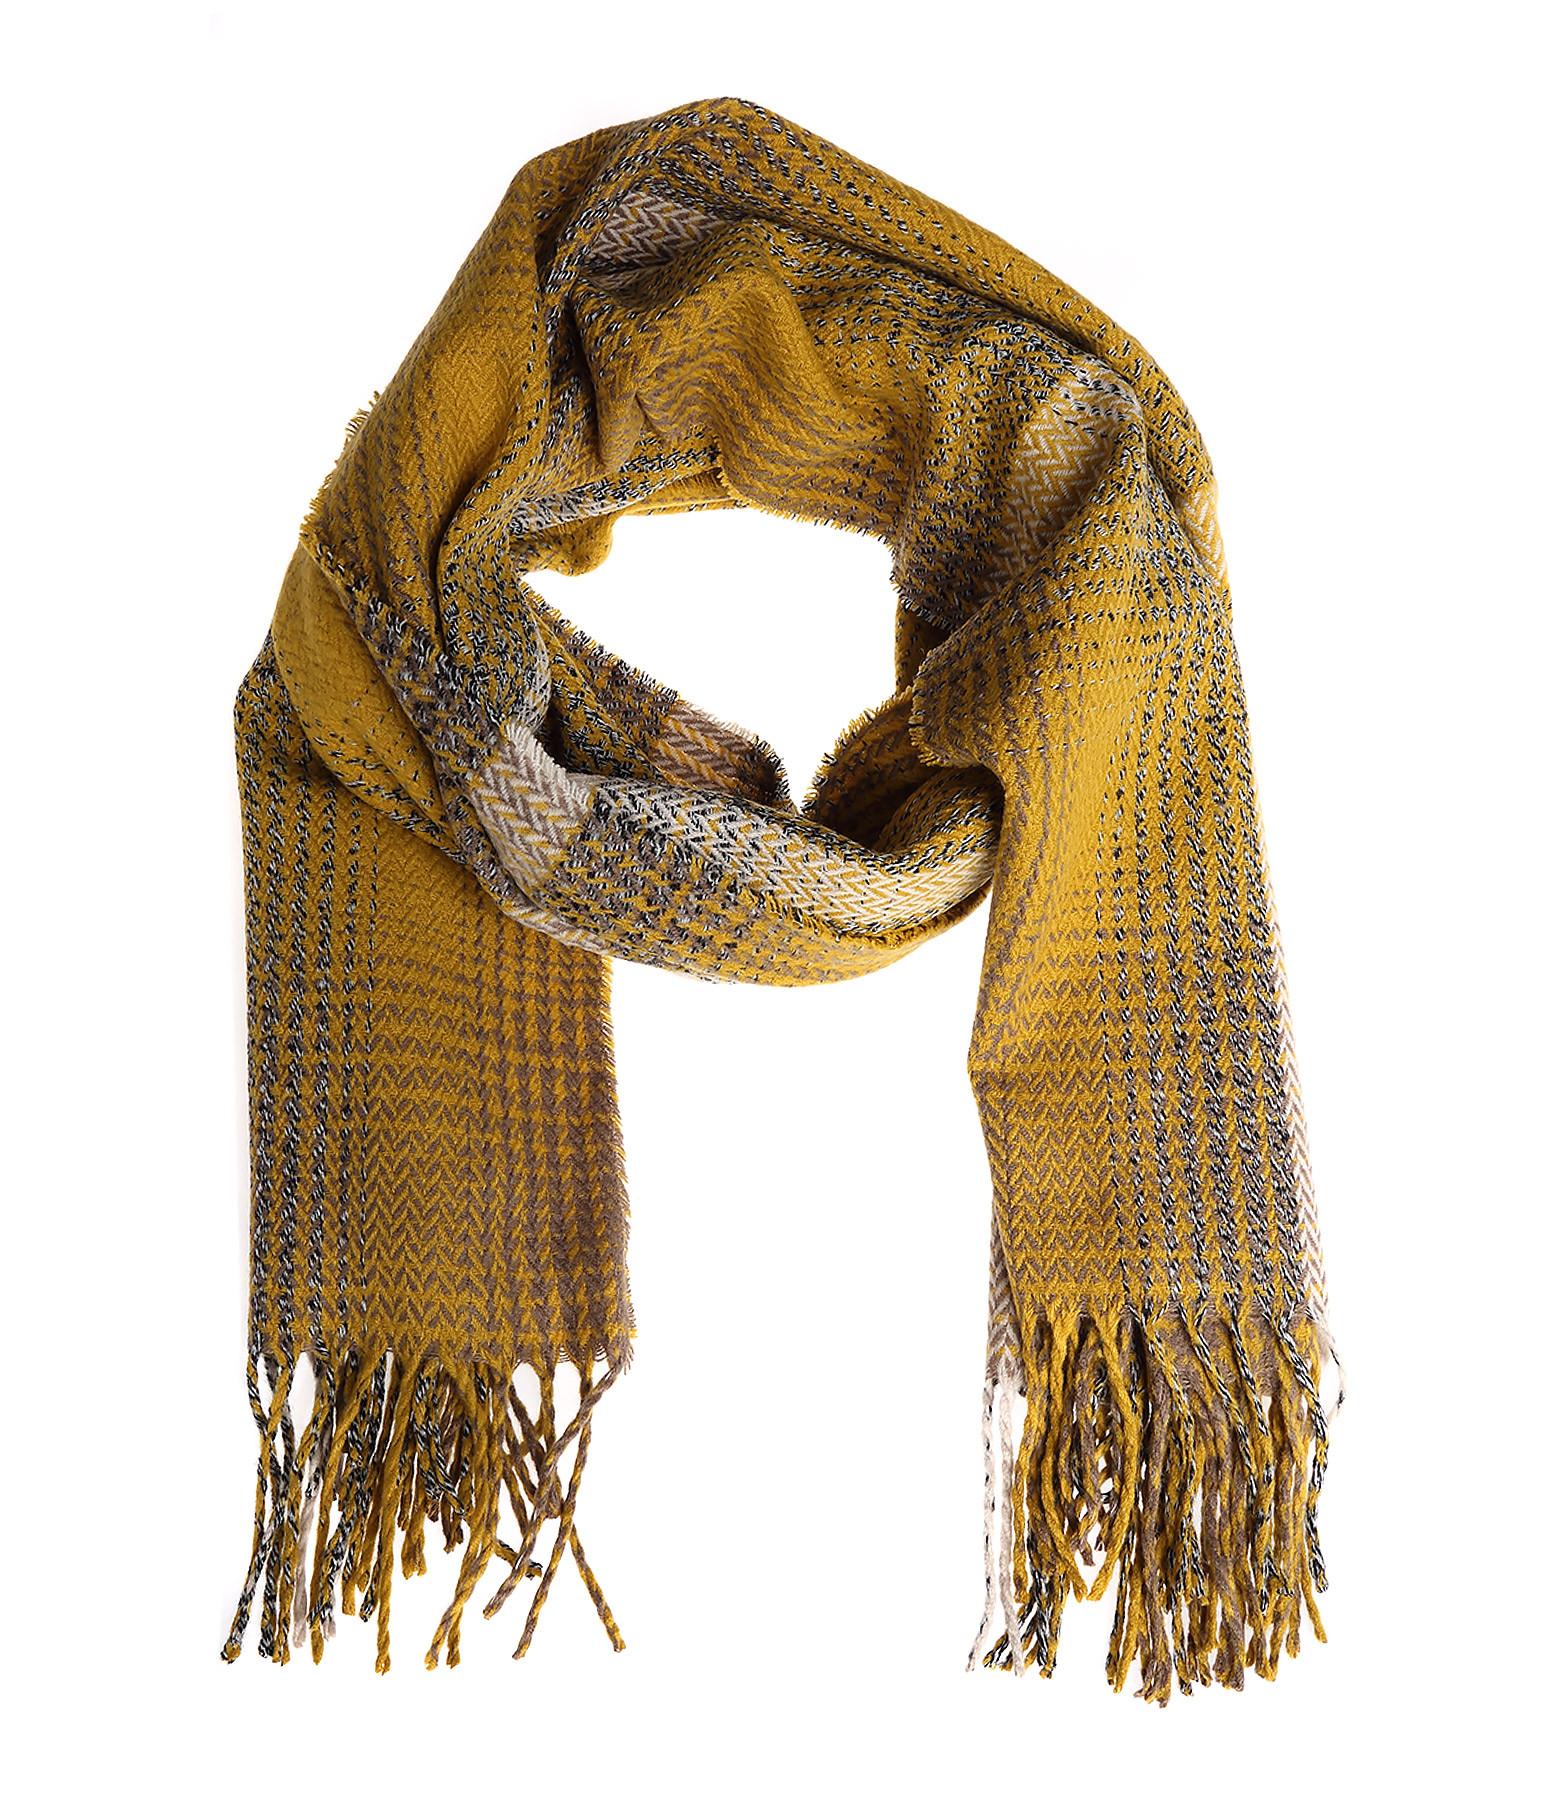 echarpe tricot moutarde/beige - l.a market